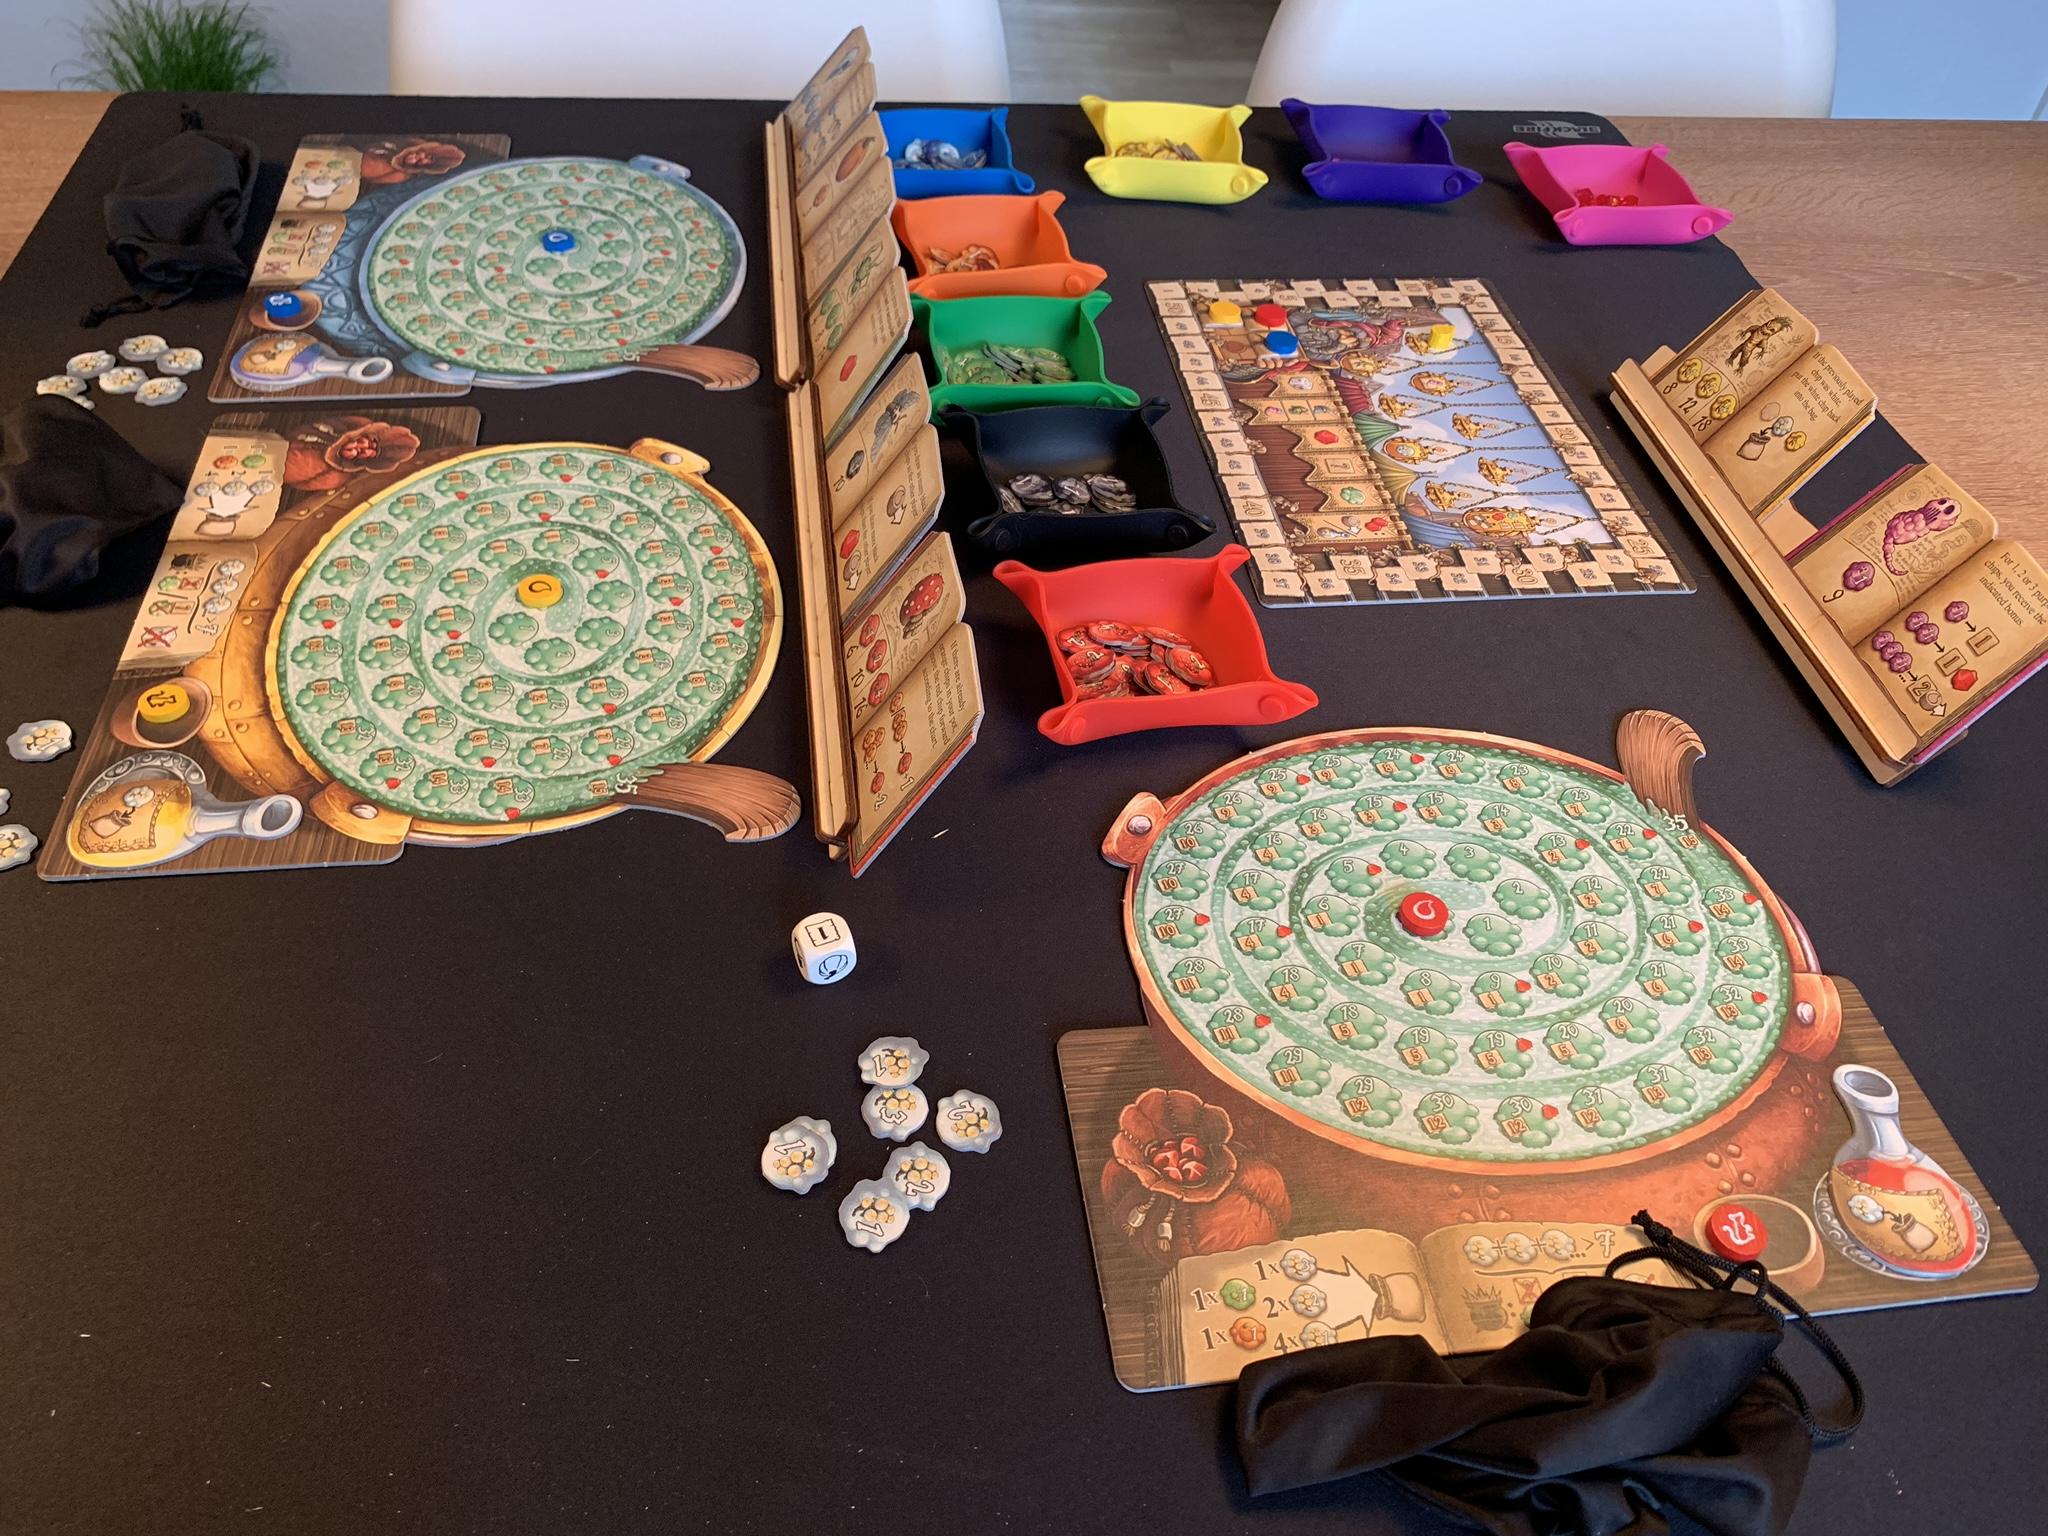 Remote play setup - 3 players